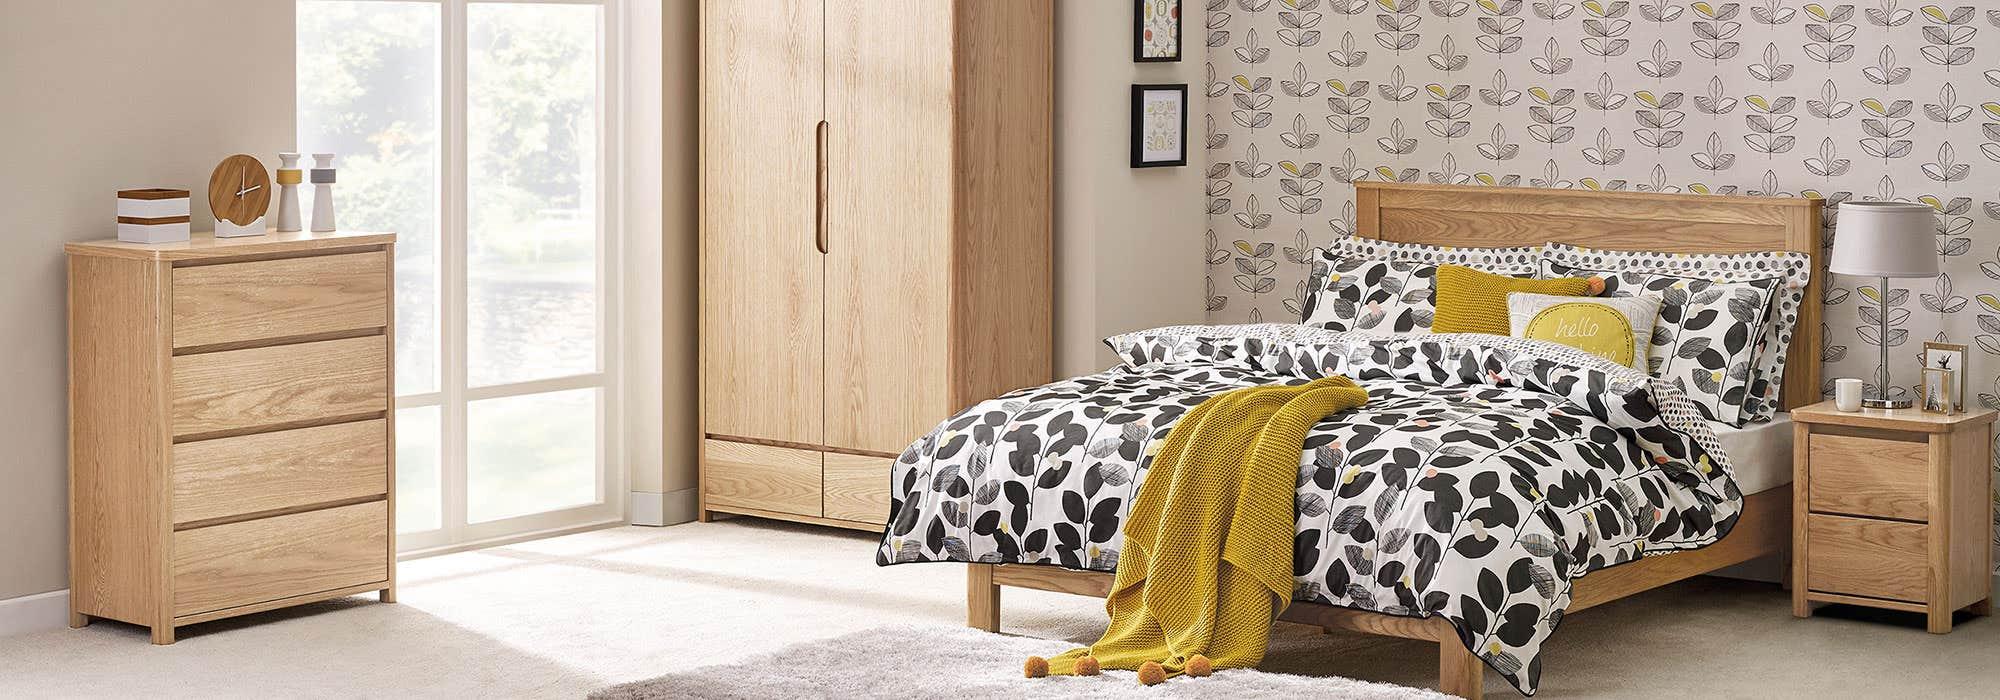 Jasper Bedroom Furniture